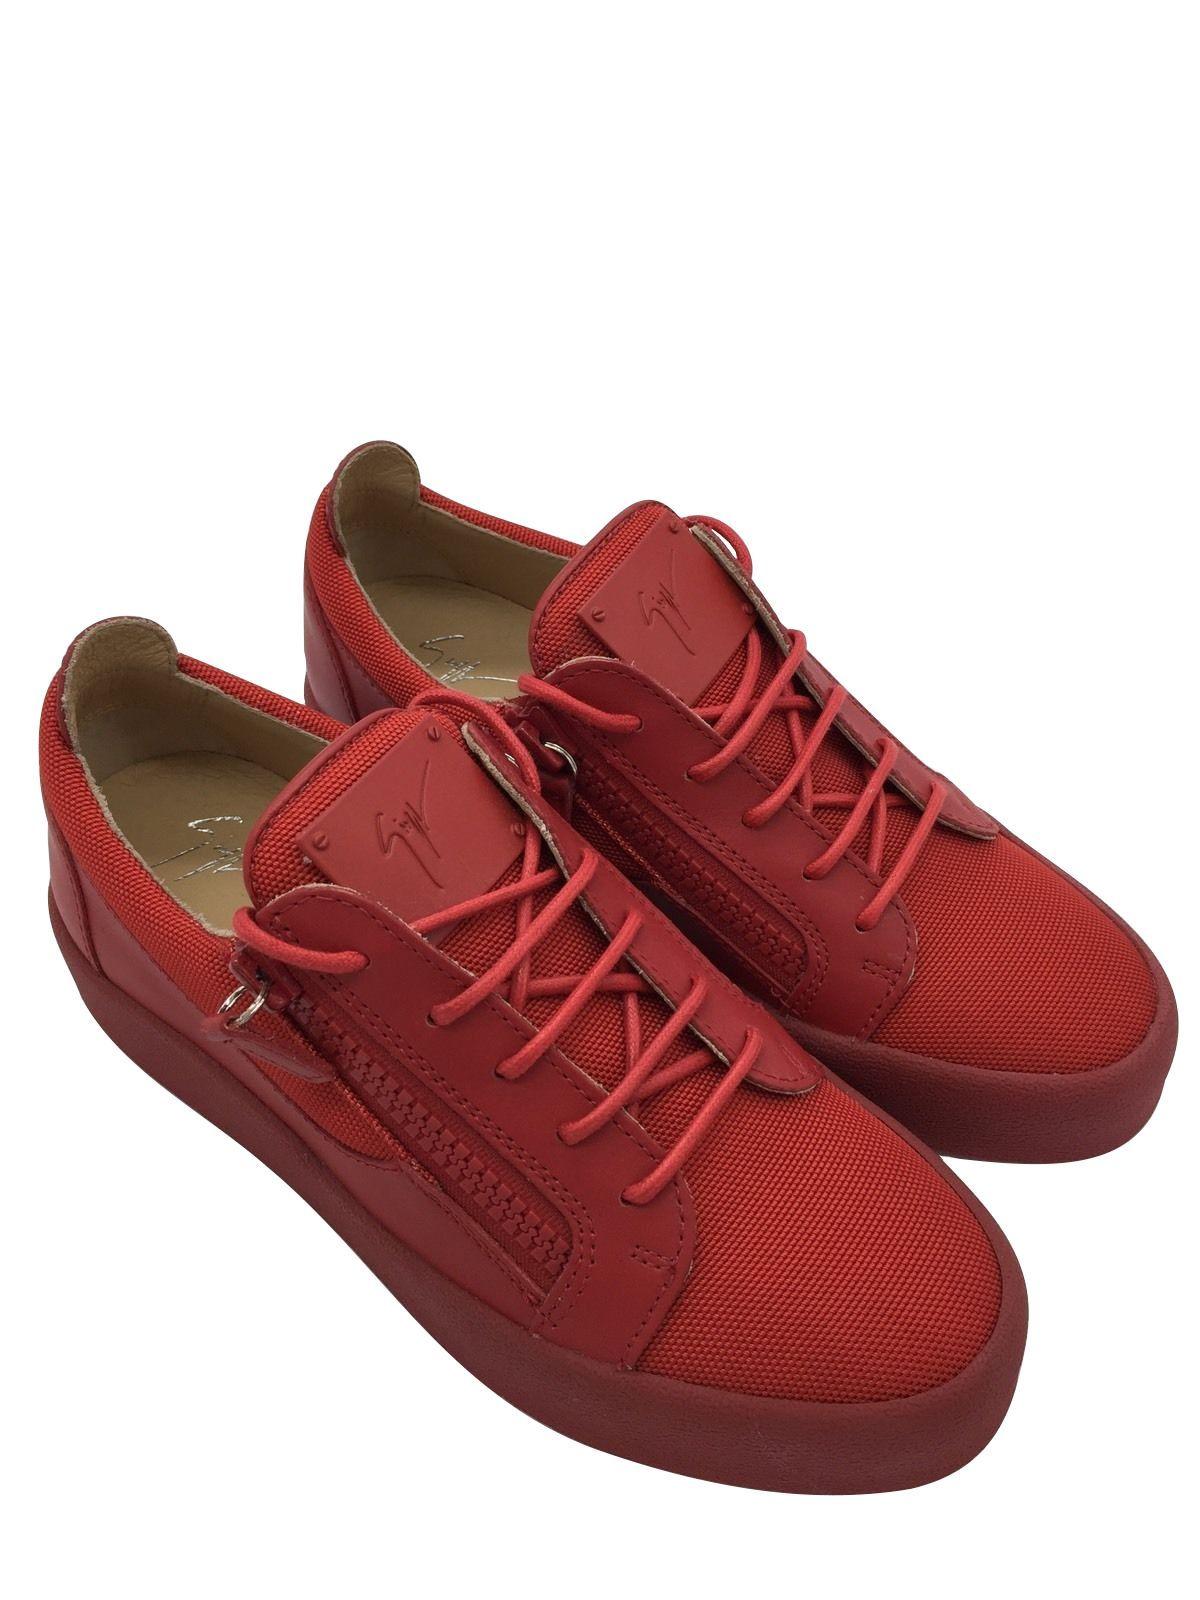 001d30ca5d410 GIUSEPPE ZANOTTI DESIGN FRANKIE DOUBLE ZIP RED LOW TOP SNEAKER ...